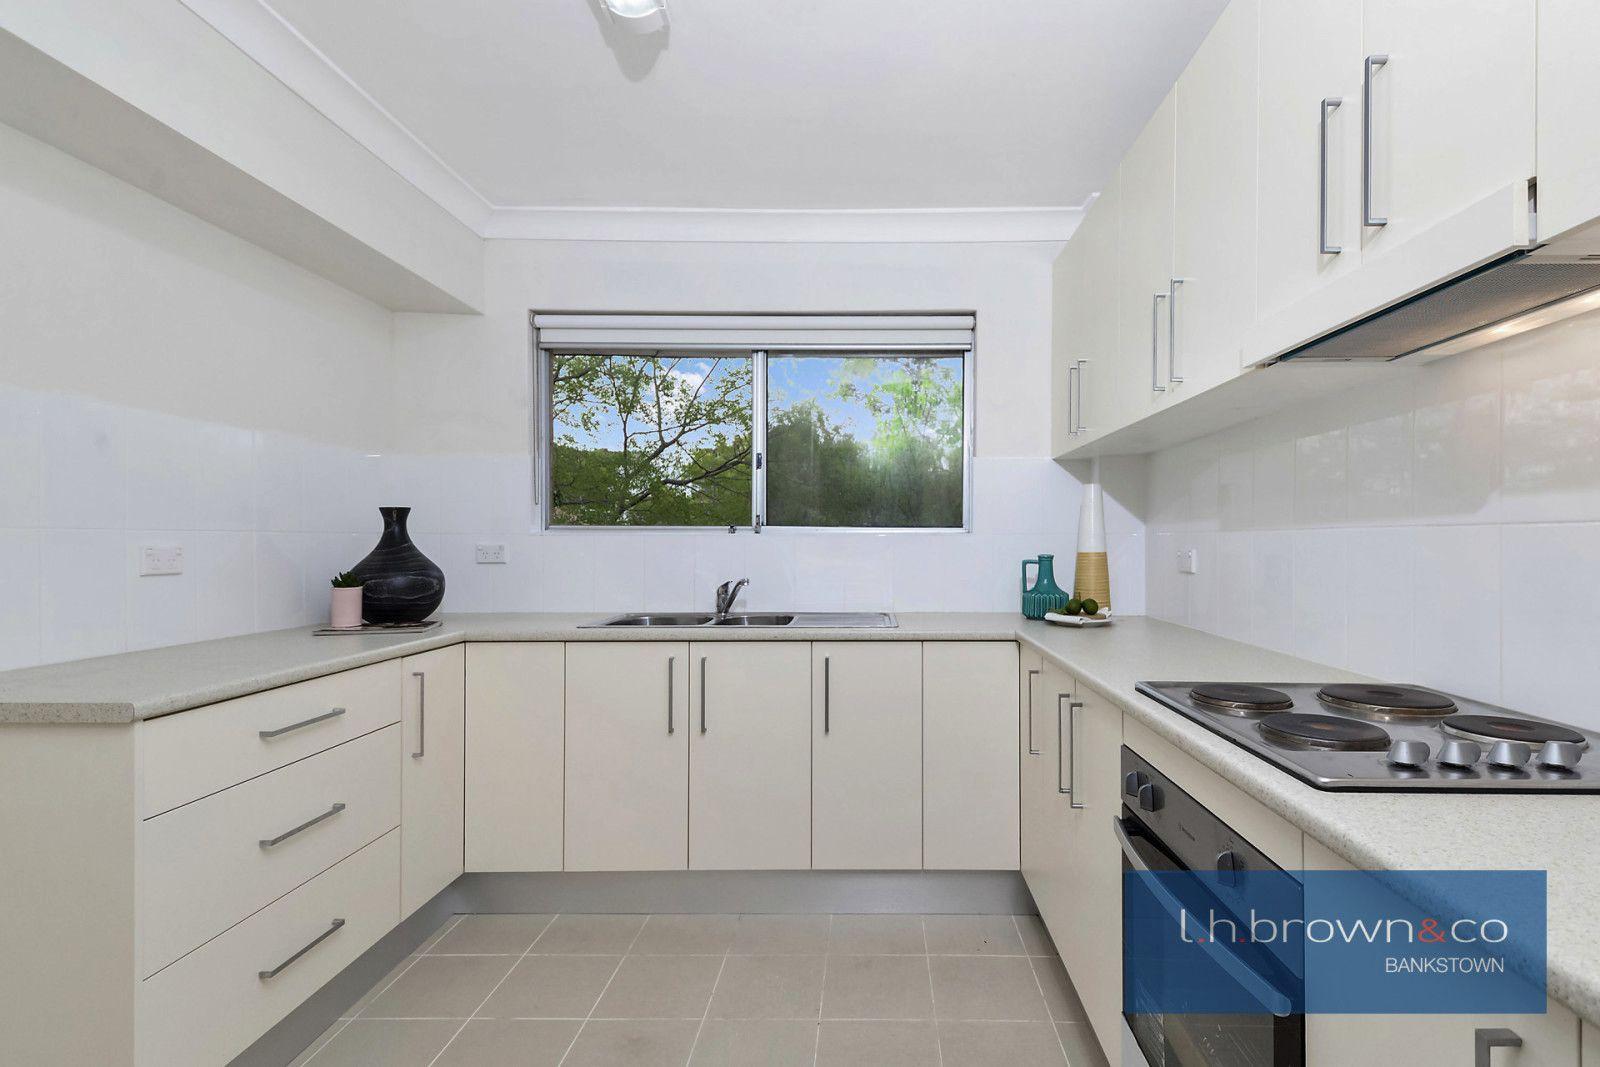 Unit 4/49 Jacobs St, Bankstown NSW 2200, Image 2